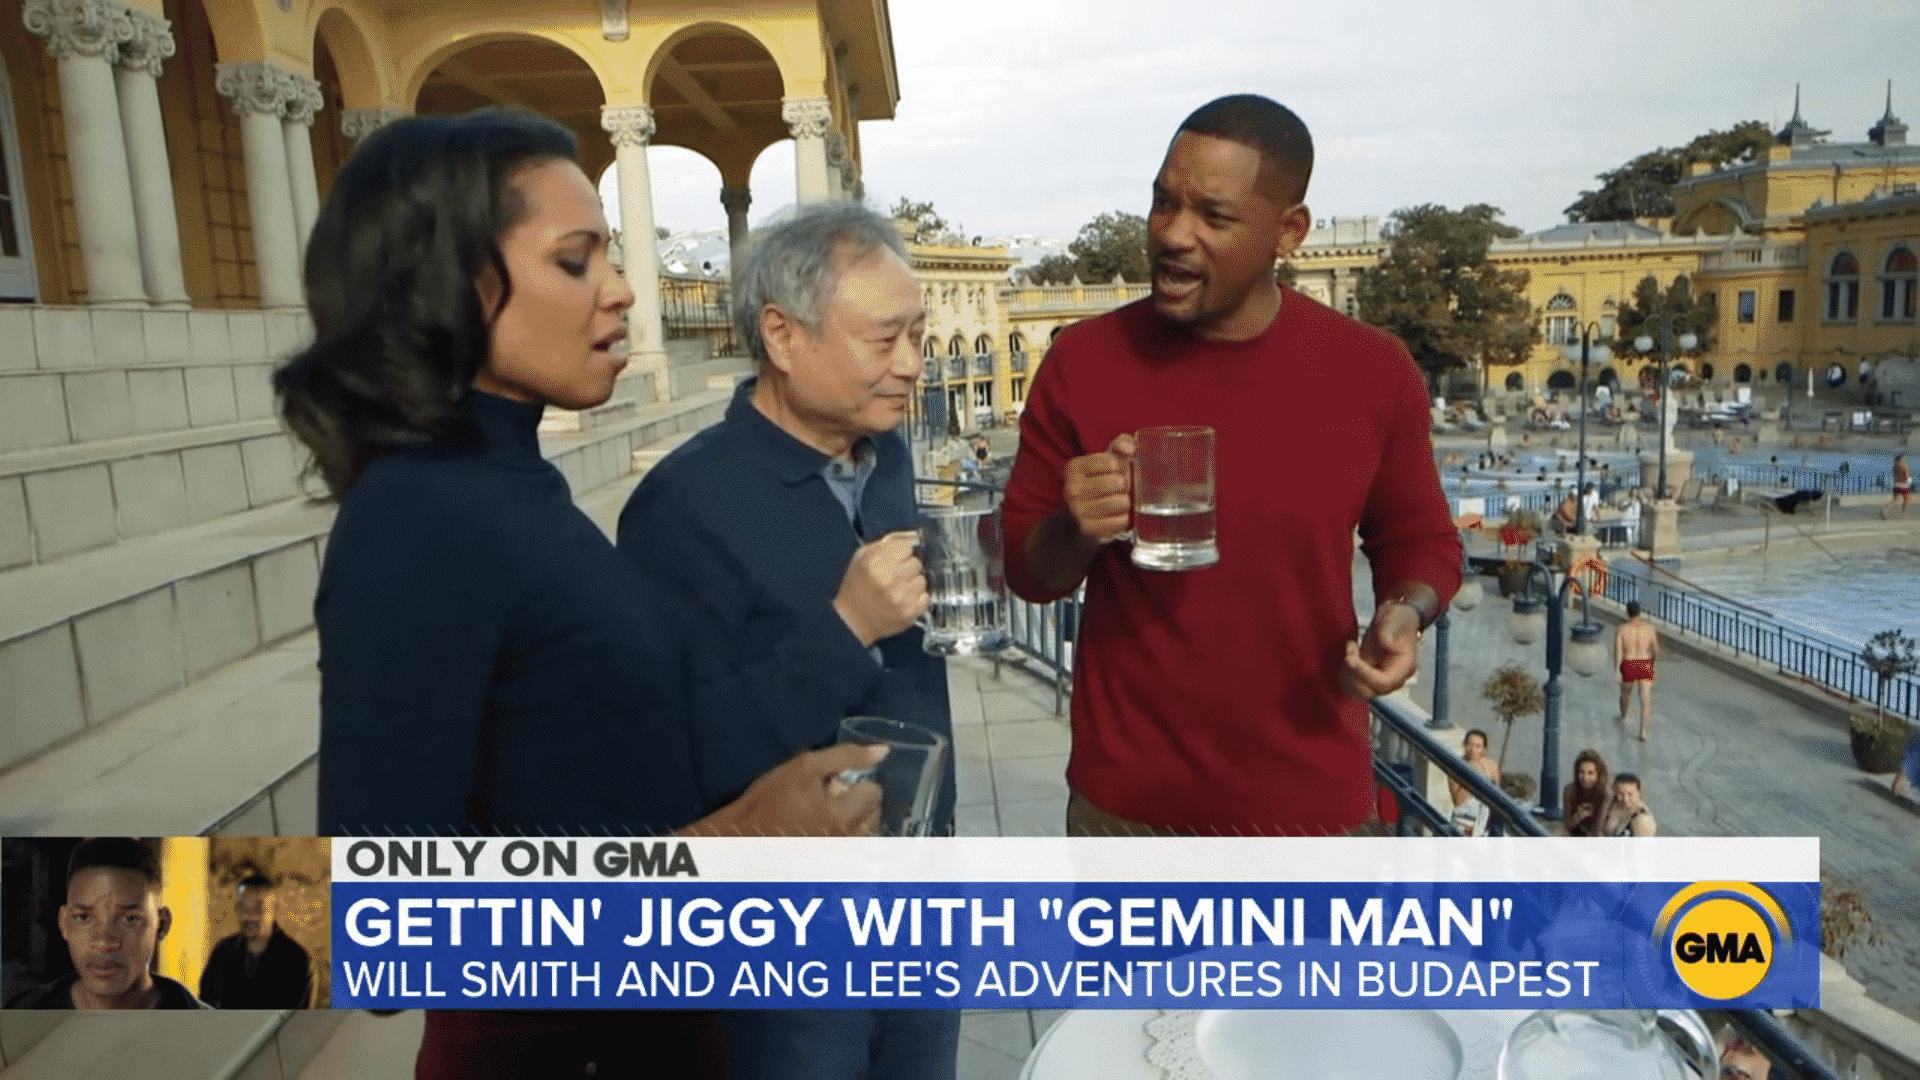 Will Smith, Széchenyi Thermal Bath, Gemini Man, Budapest, Hungary